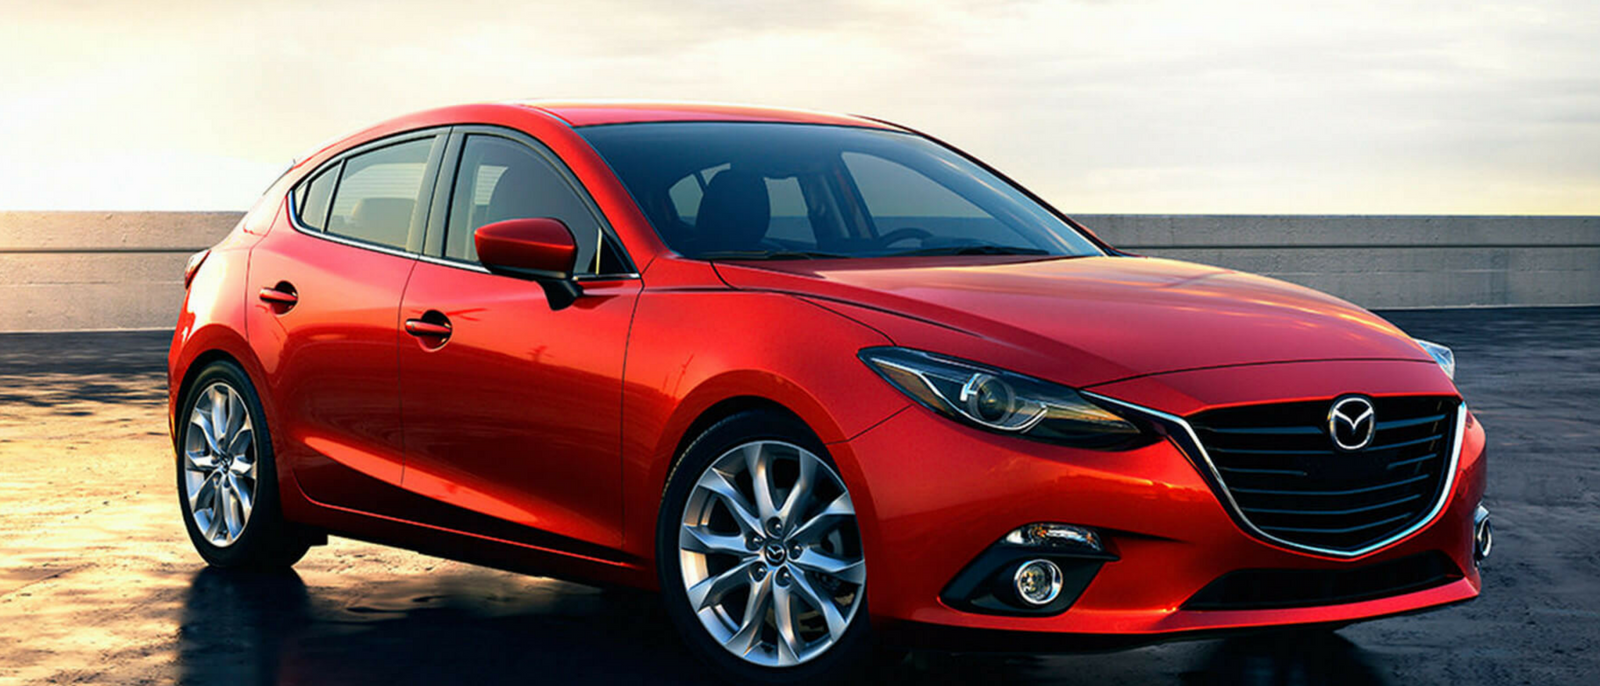 2016-Mazda-Hatchback-Exterior-01